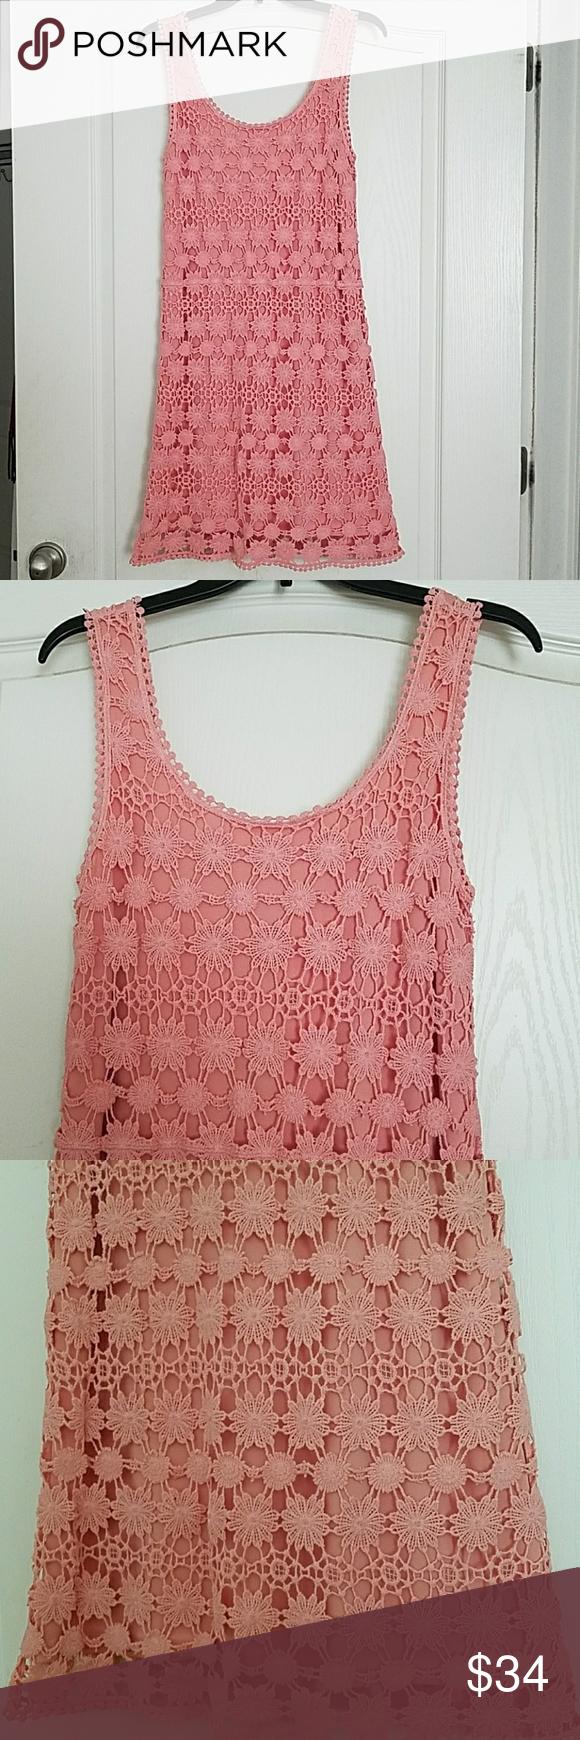 Dress Size 6 LC Lauren Conrad NWT